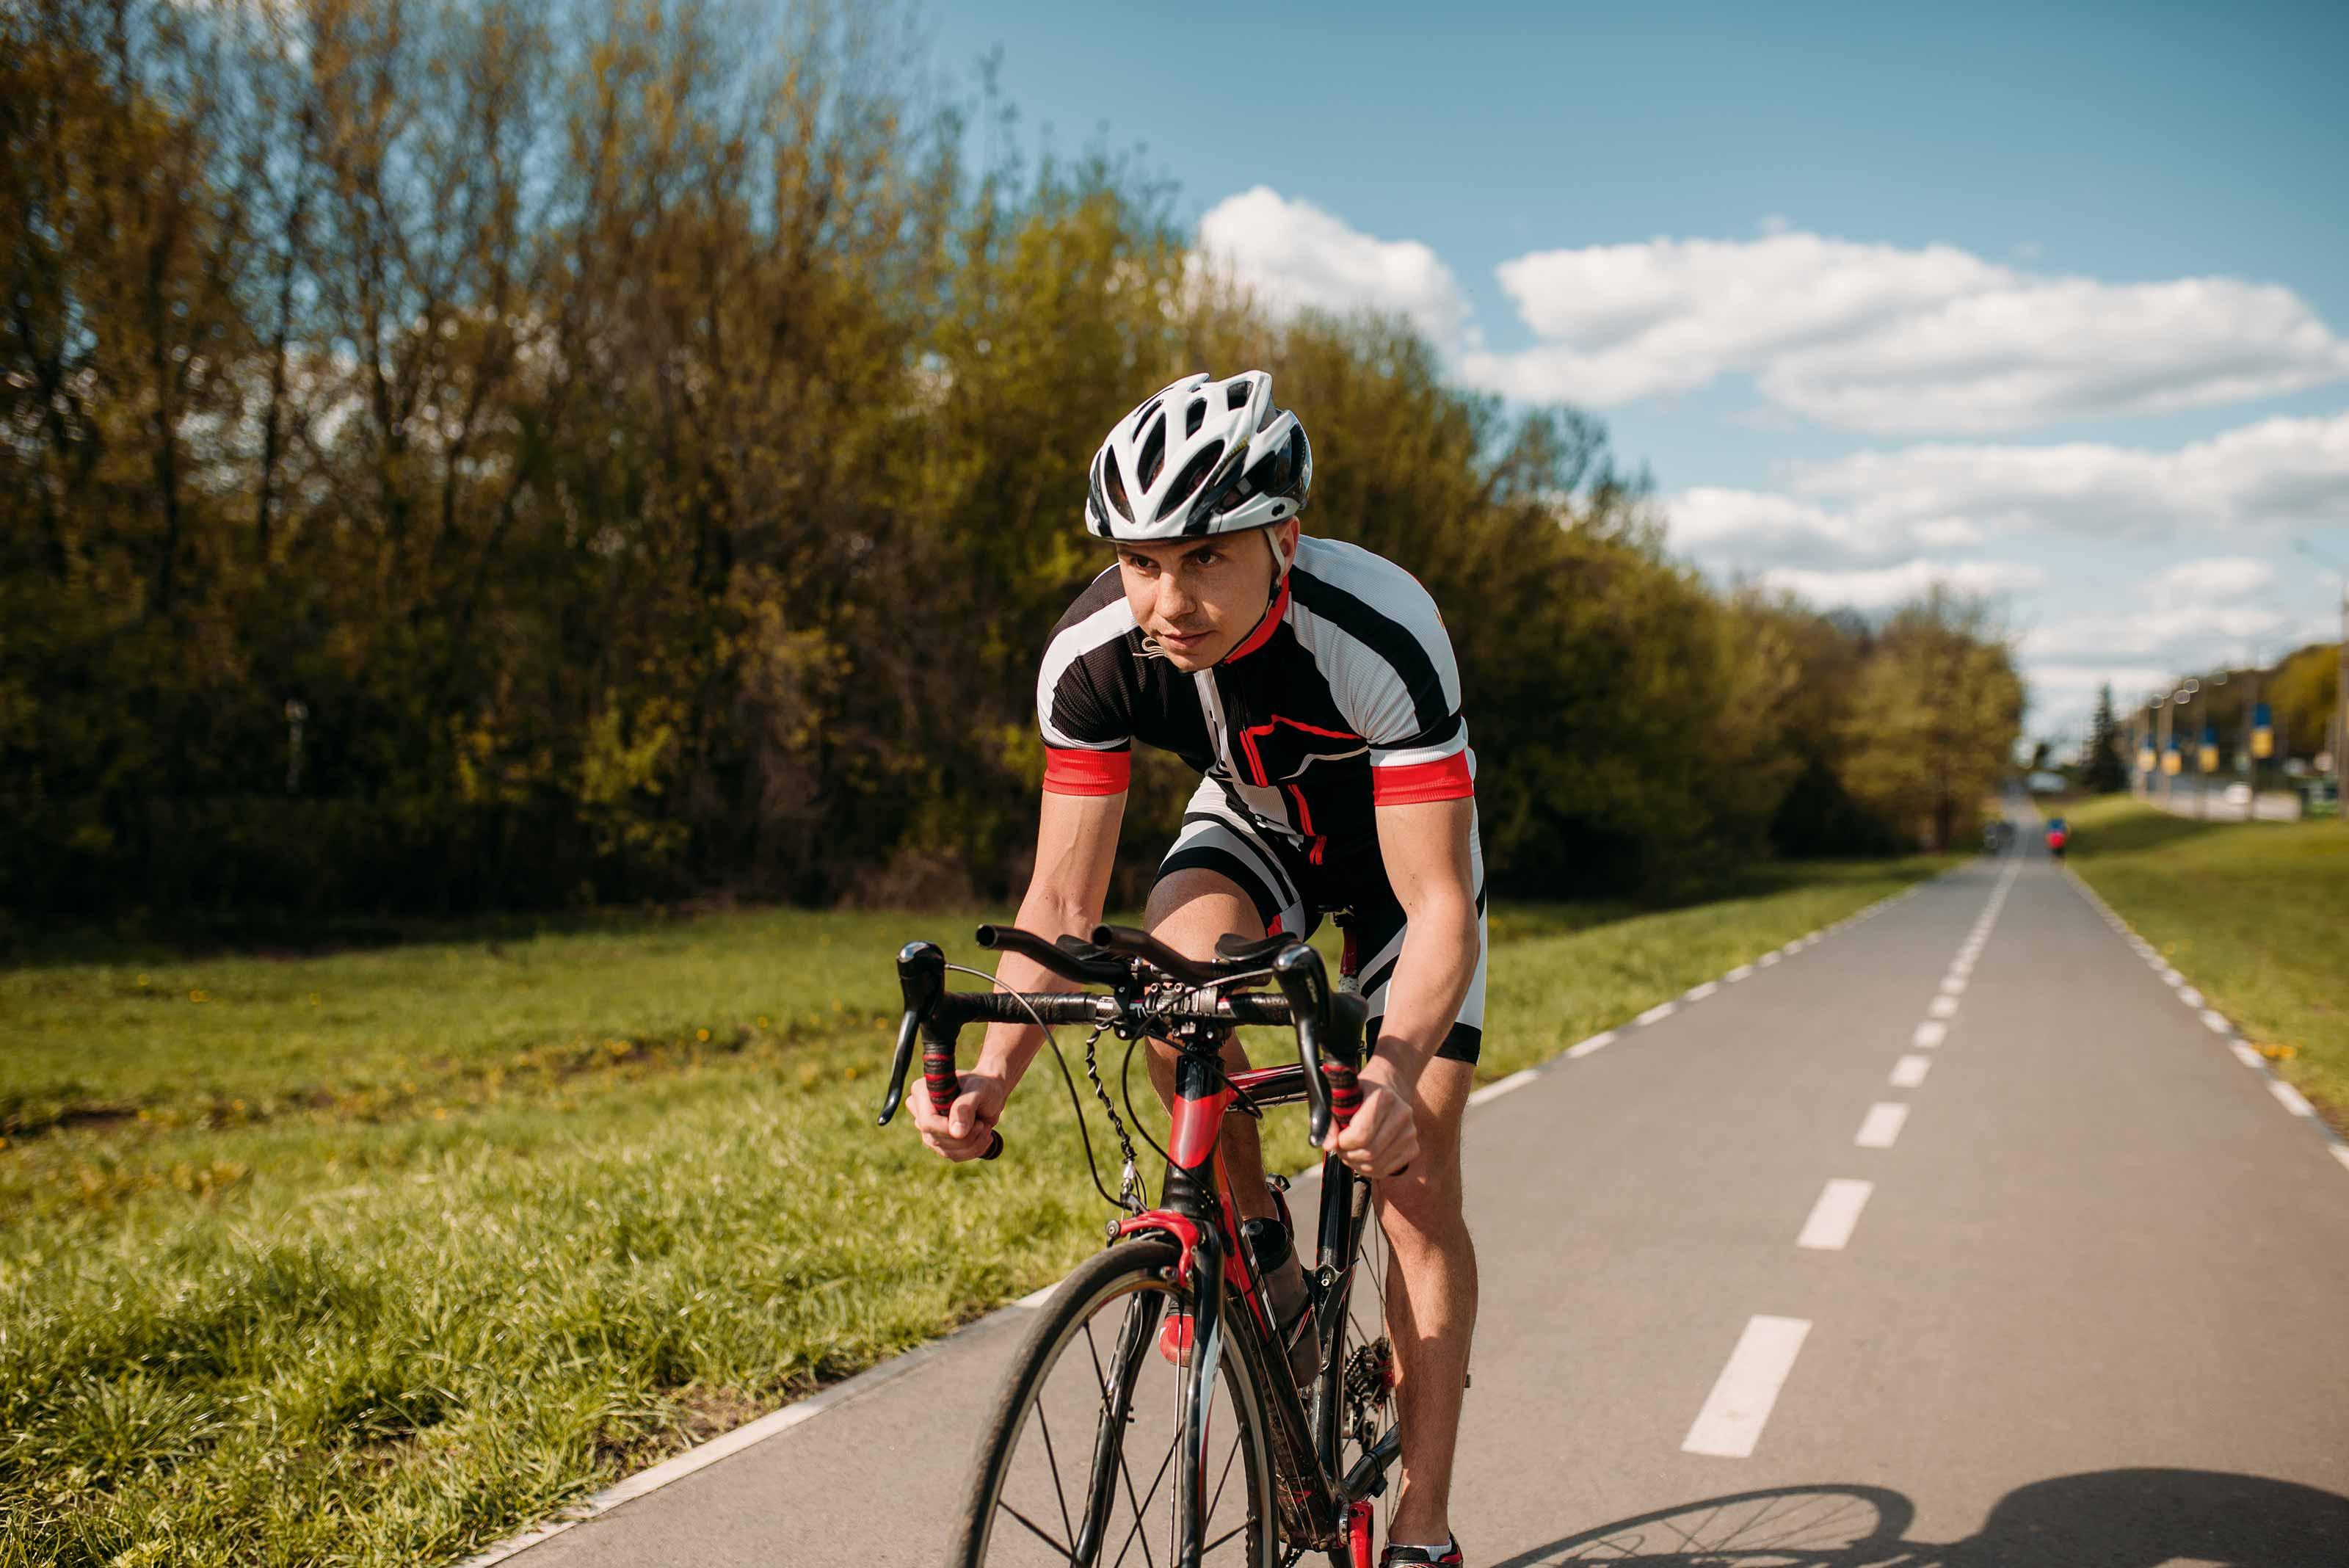 Bicycle Helmet Safety FAQ's